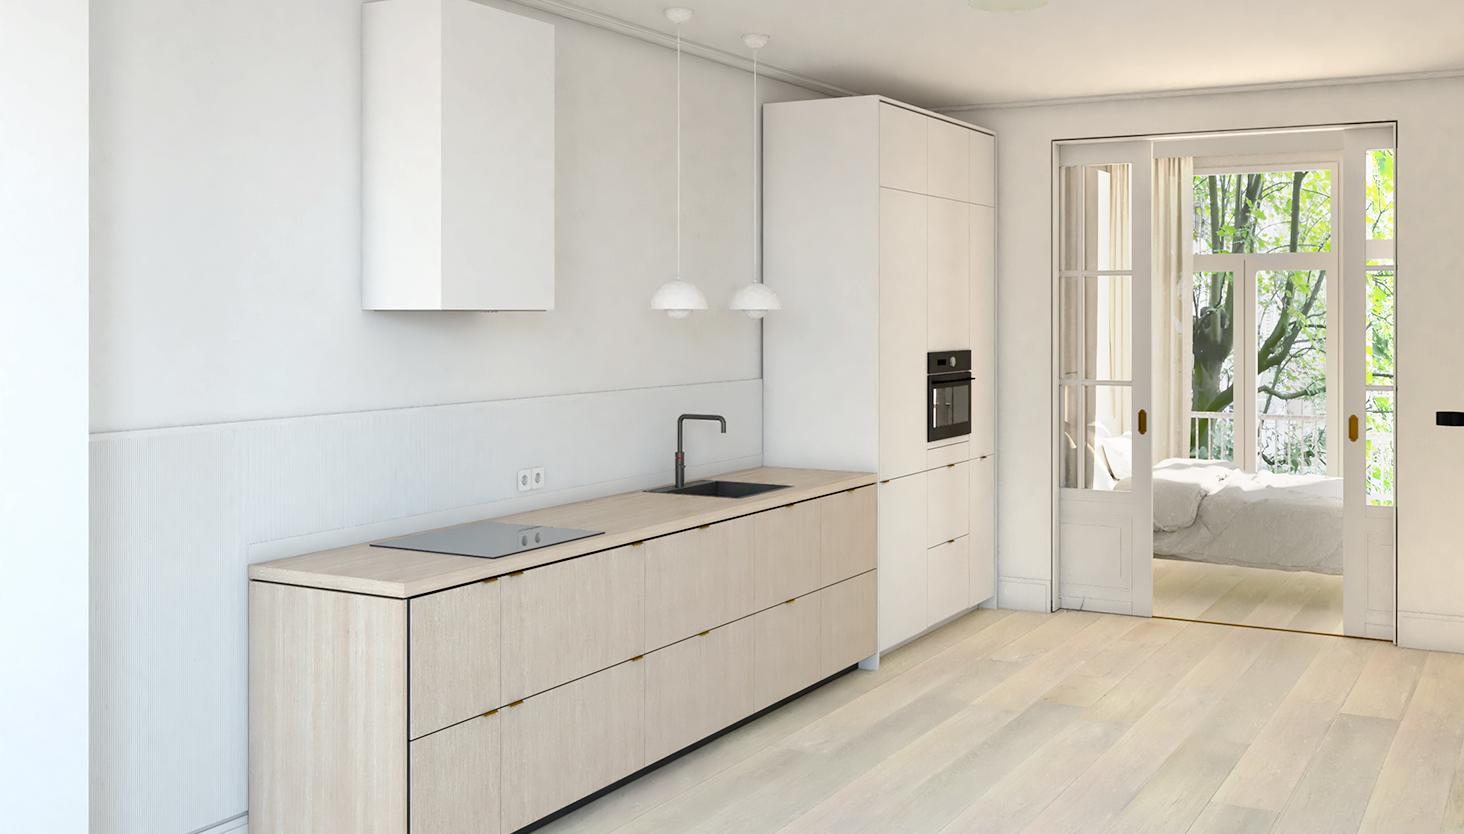 impressie keuken slaapkamer